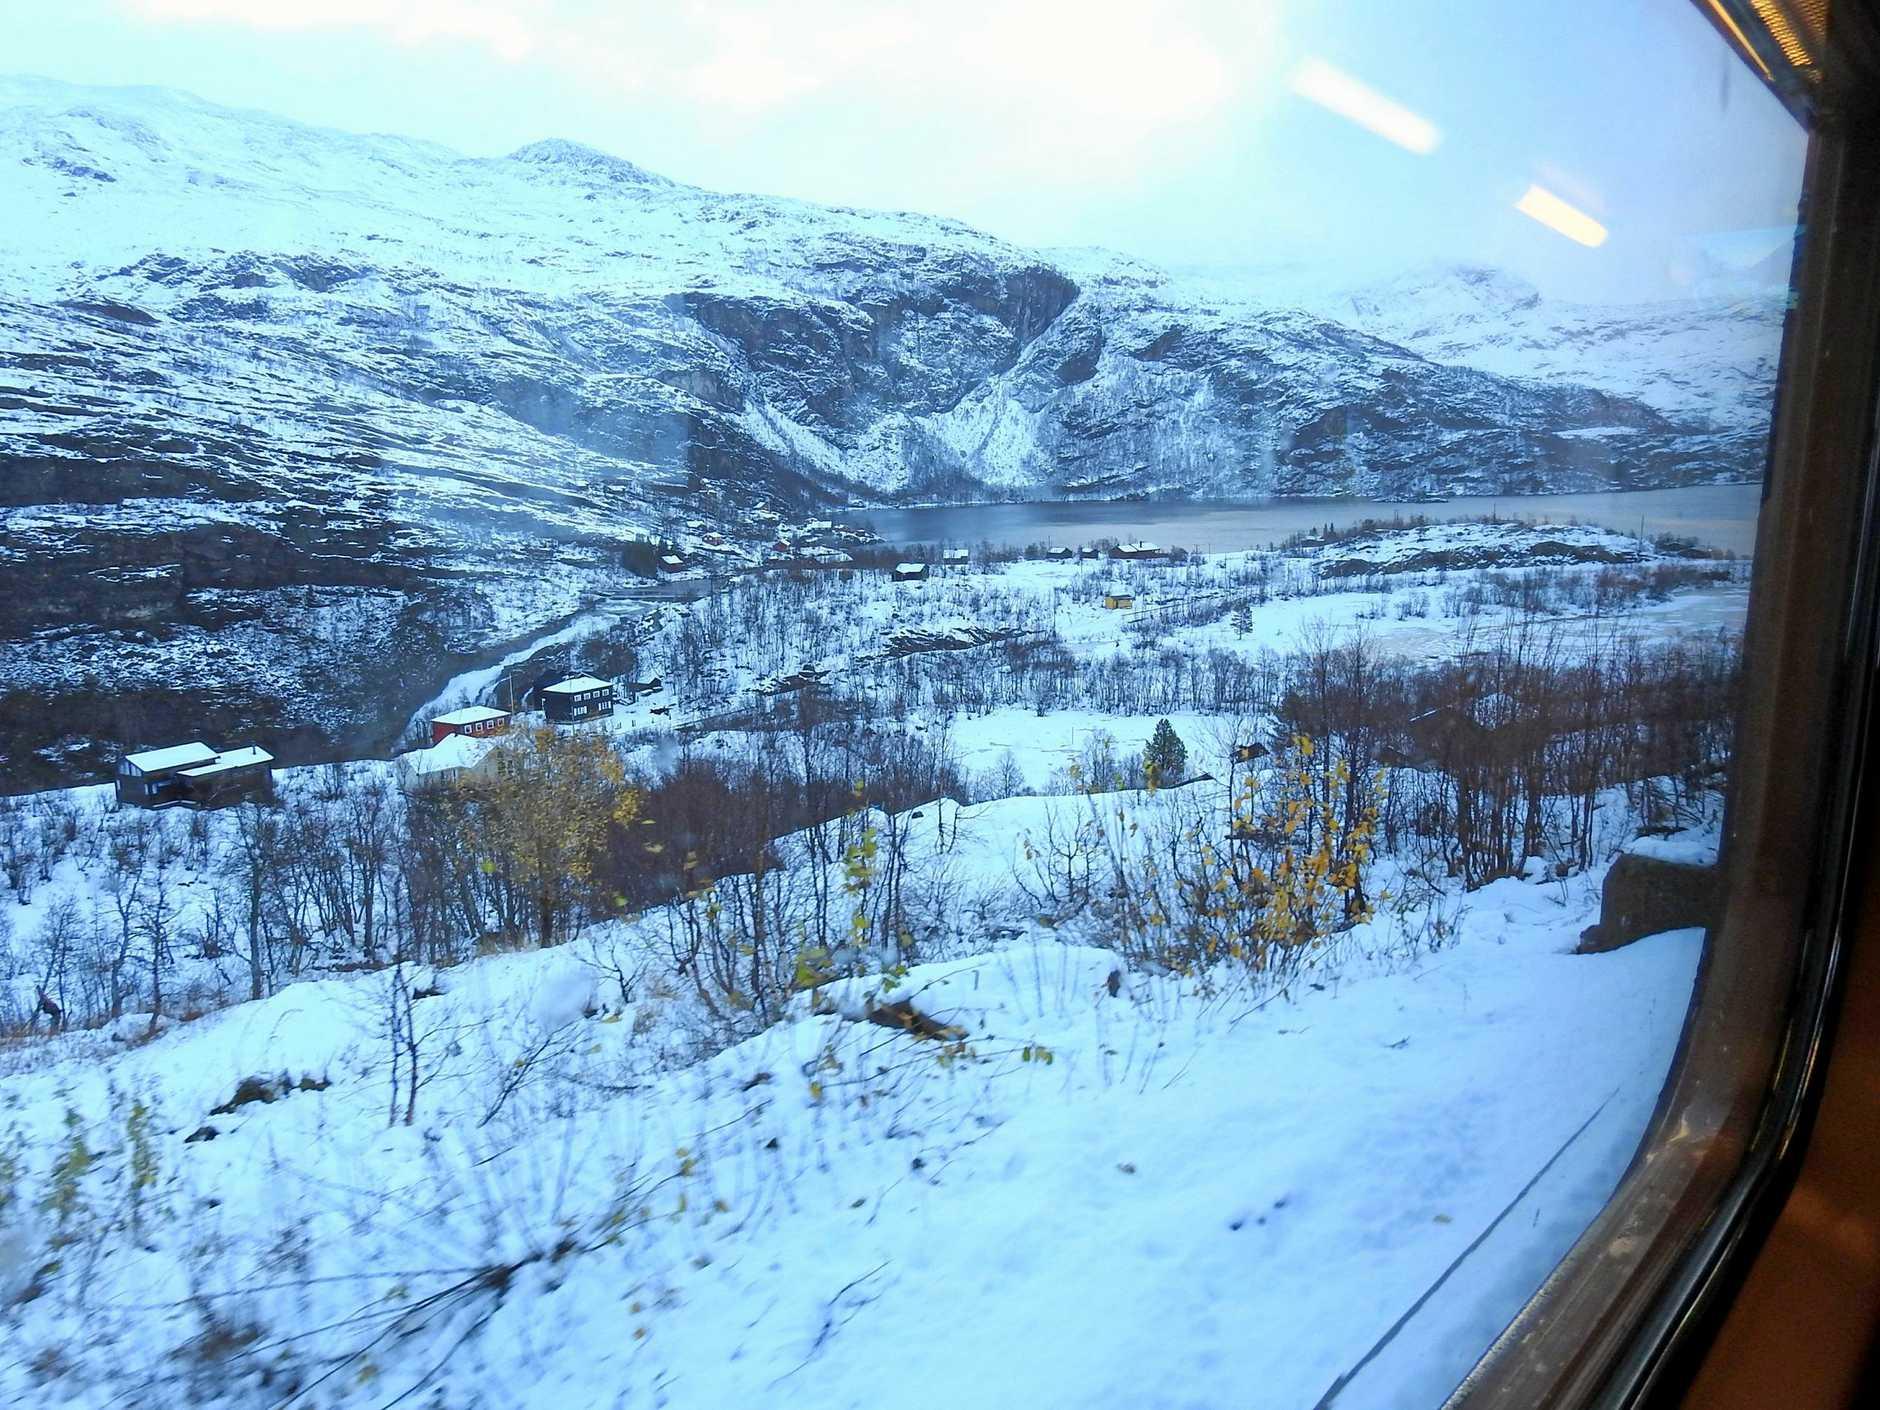 The Flåm Line is a 20.2km-long railway track between Myrdal and Flåm in Aurland, Norway.